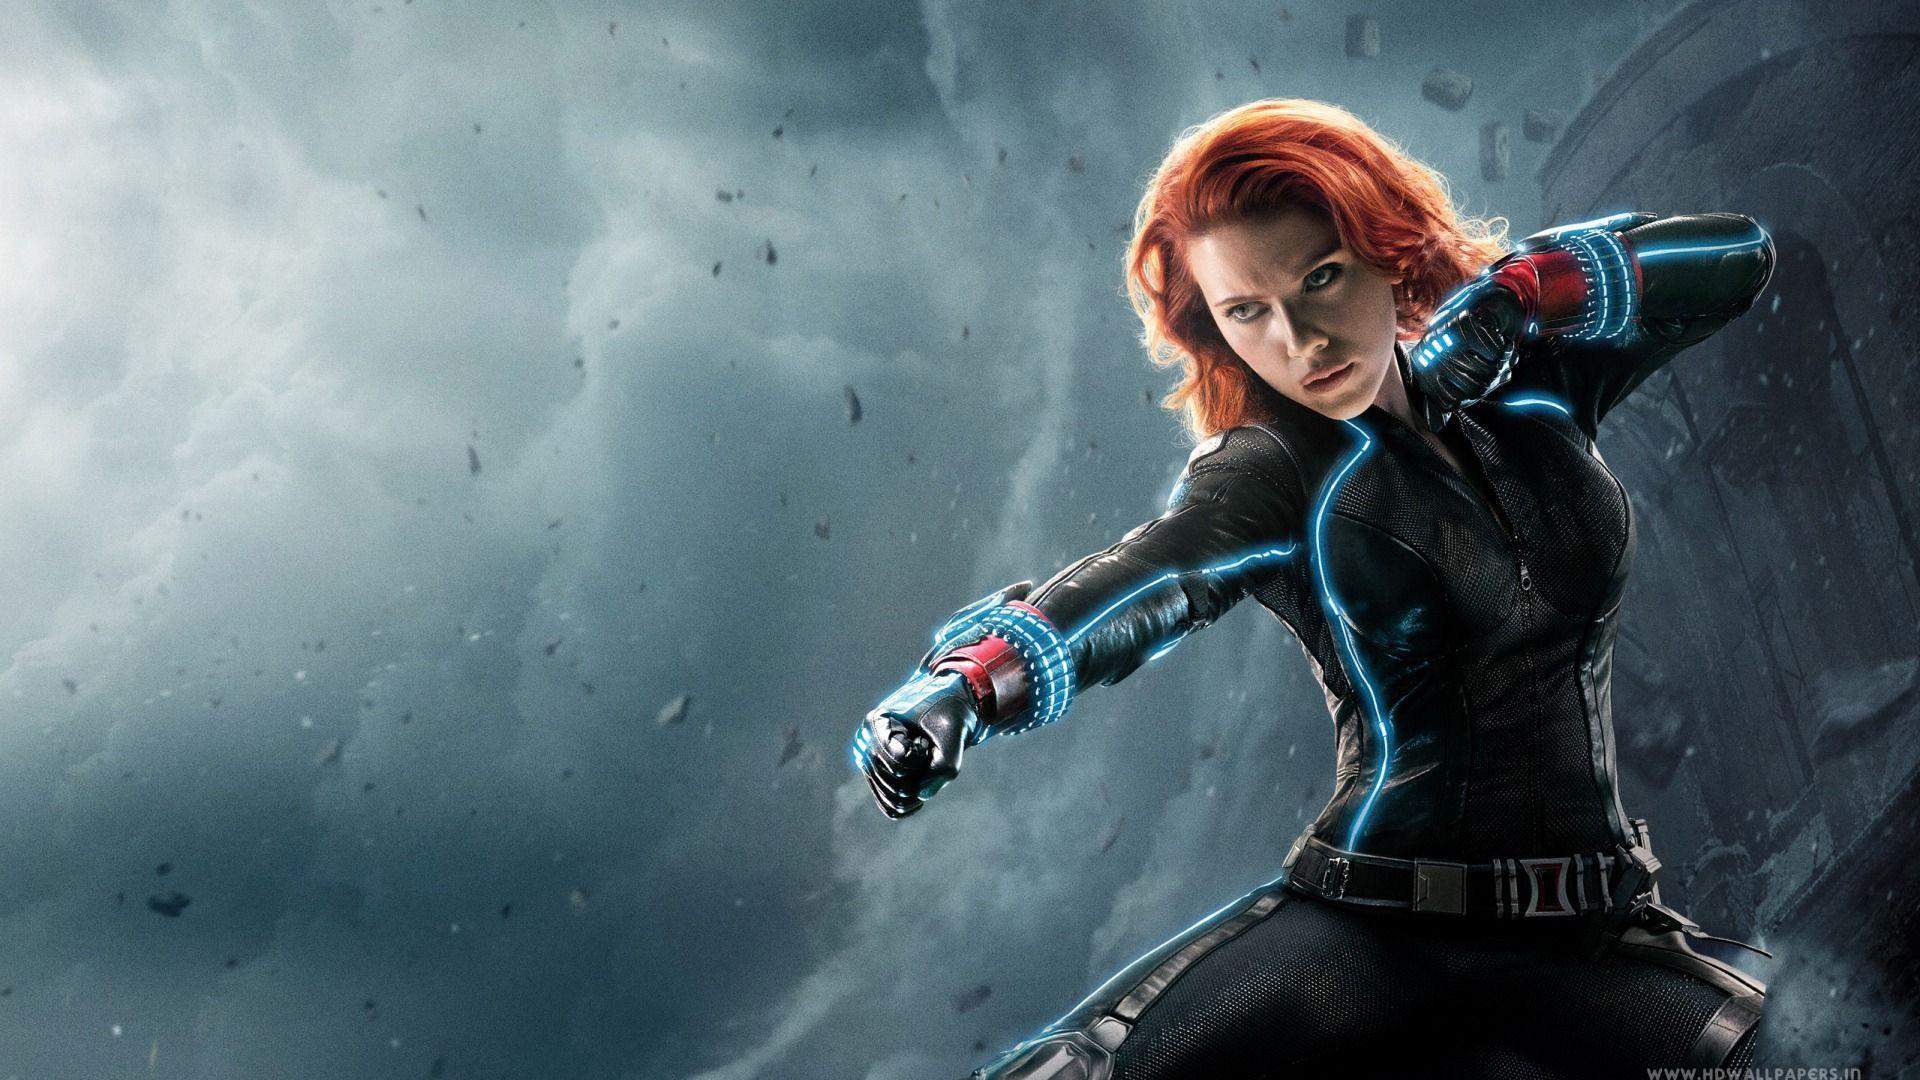 Movie Avengers Age Of Ultron Avengers Age Of Ultron Scarlett